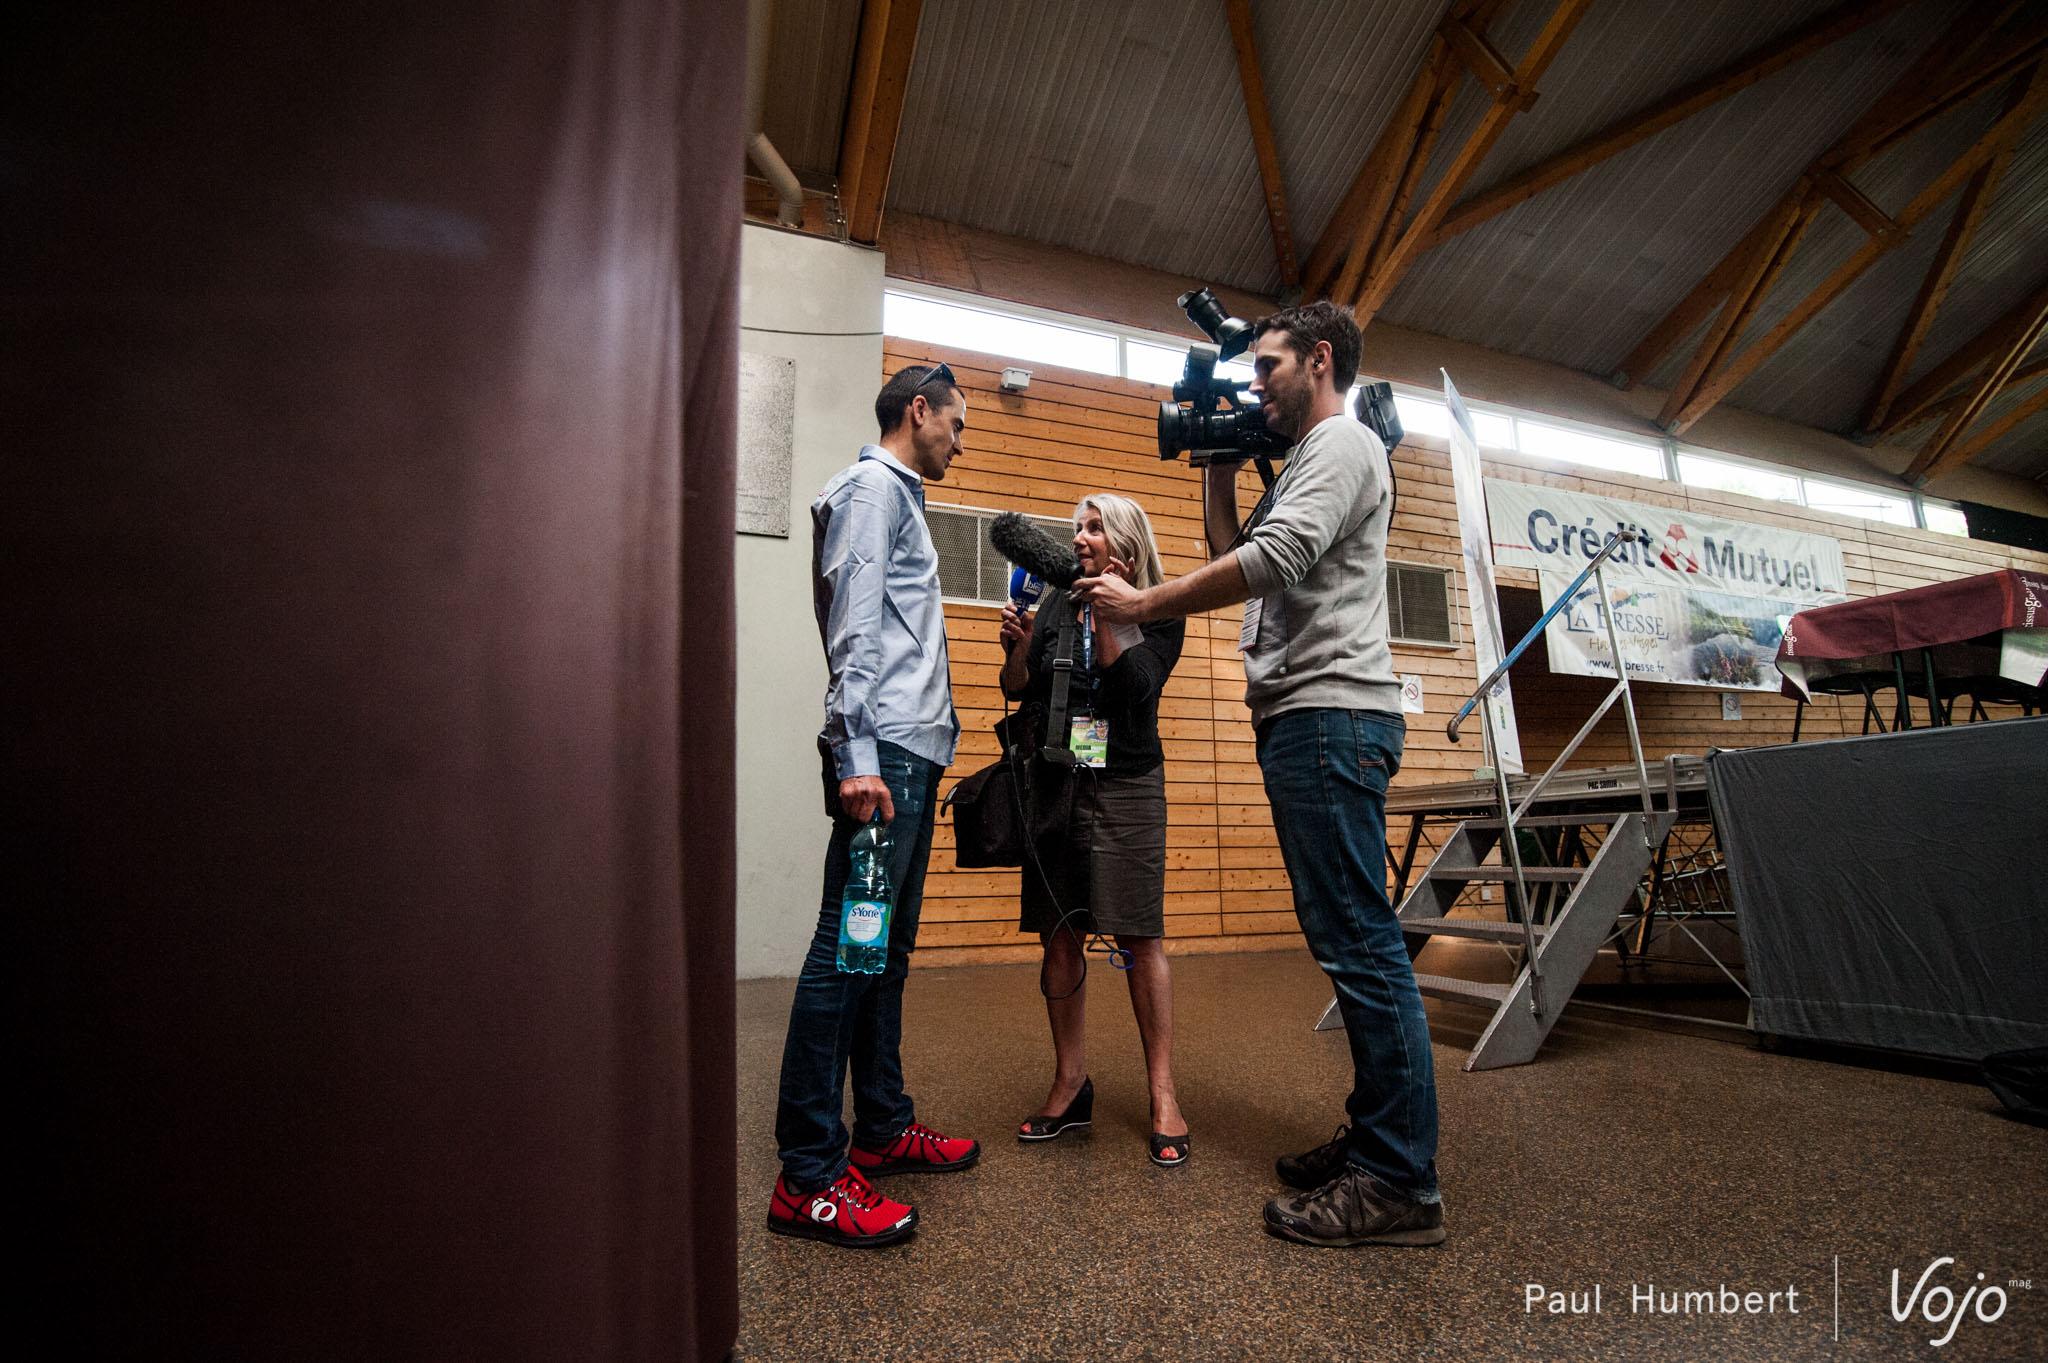 la-bresse-vojo-2016-paul-humbert-35